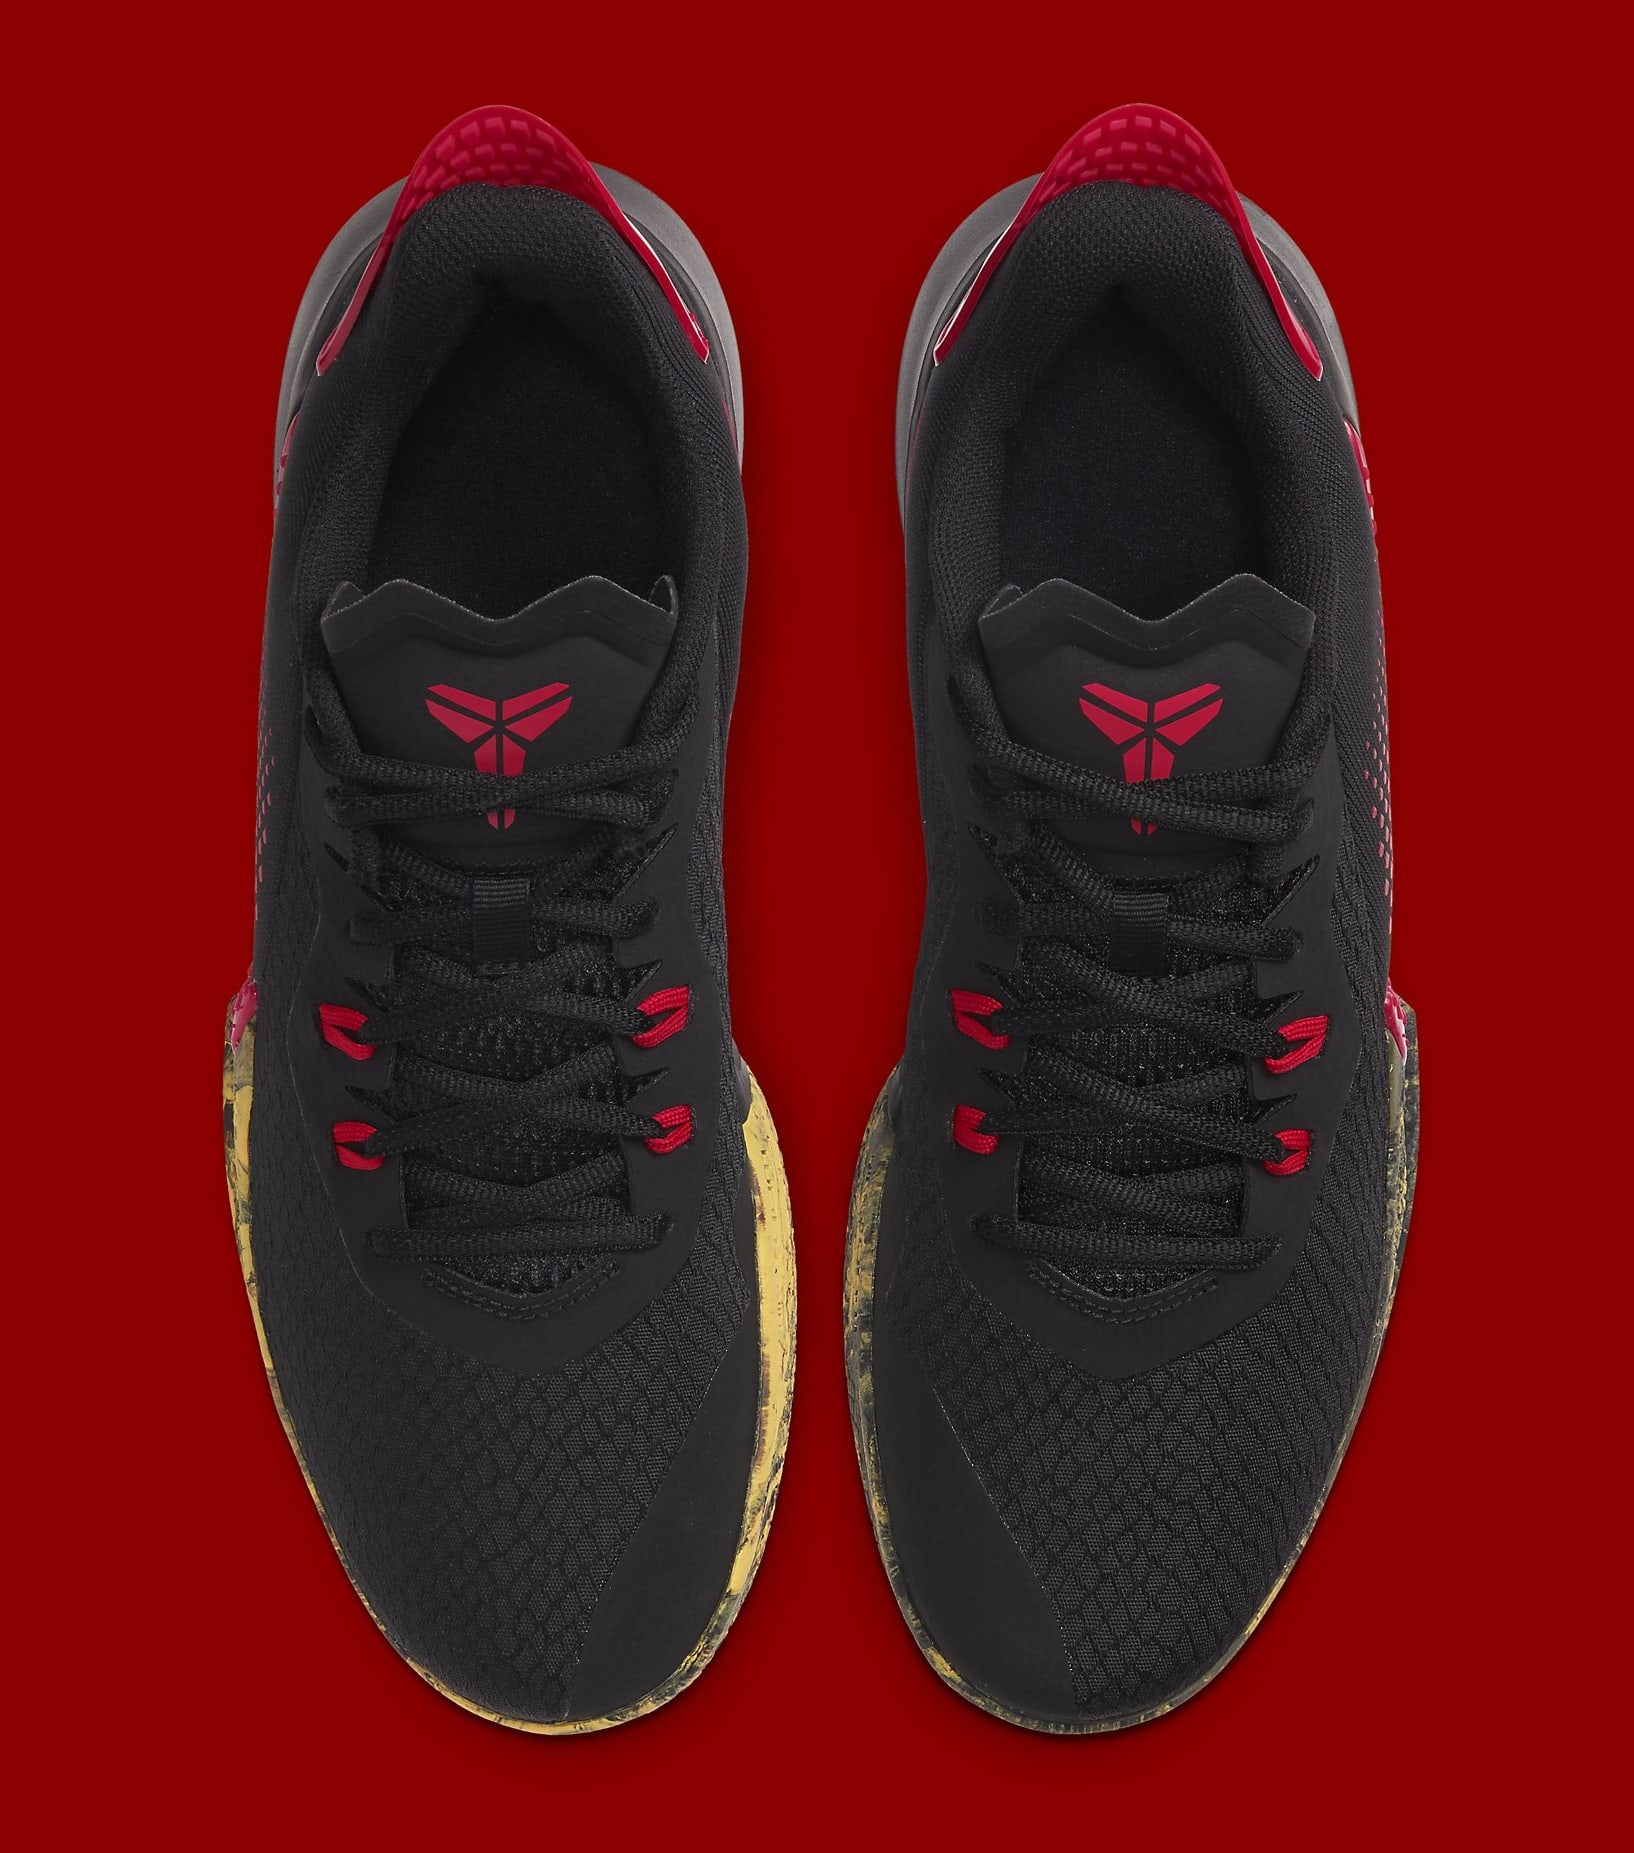 Nike Kobe Mamba Fury CK2087-002 Top